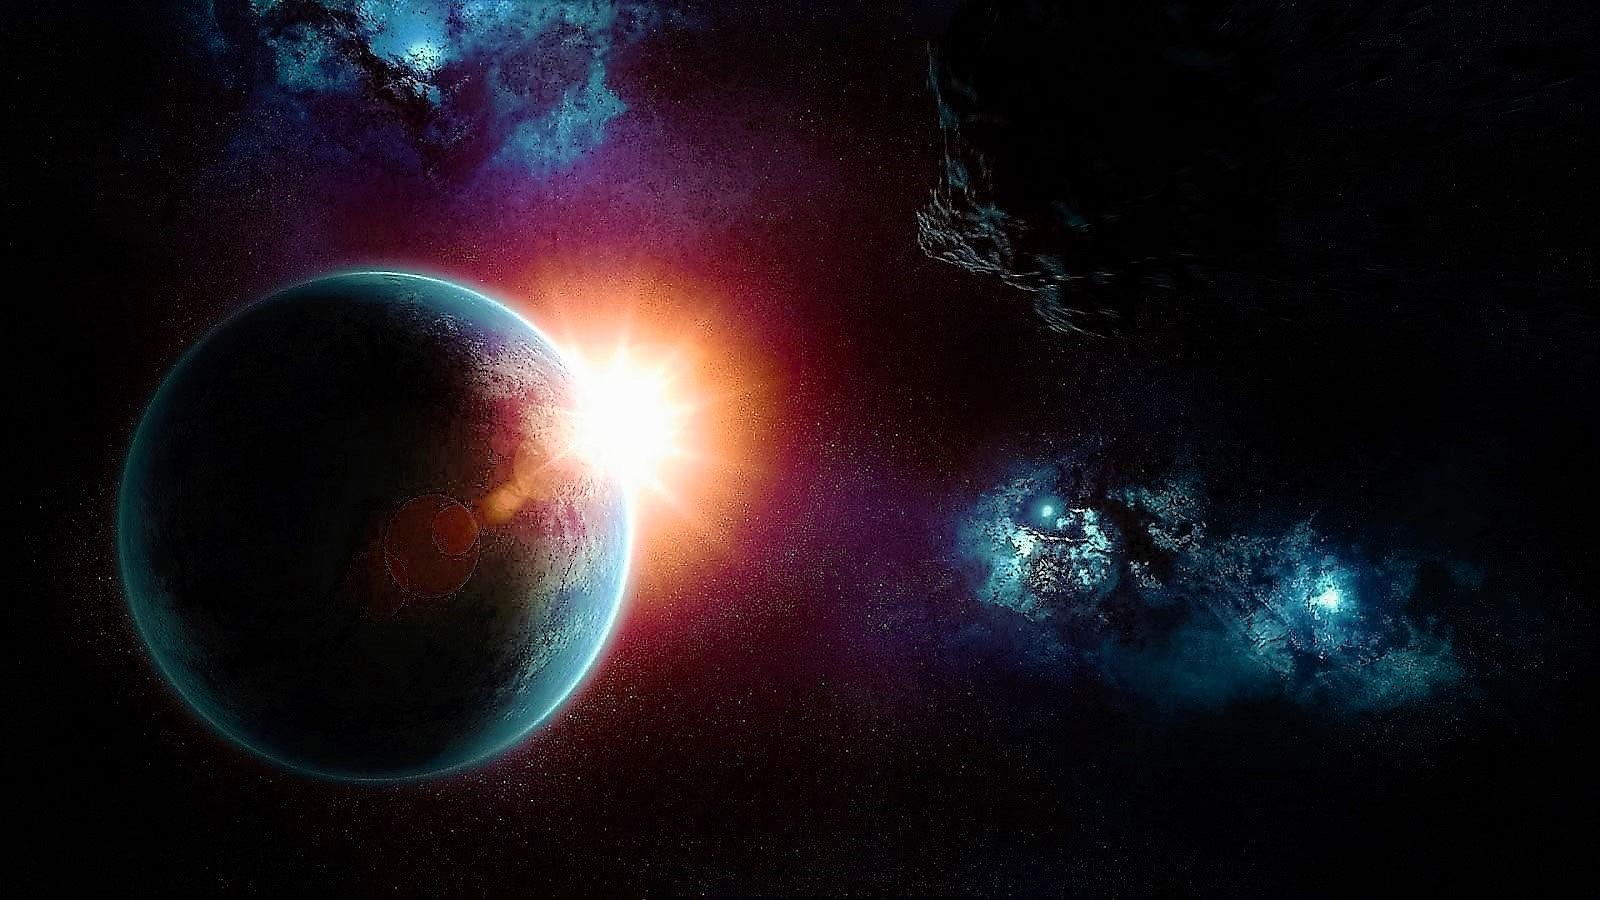 solar-eclipse-wallpaper-4-13